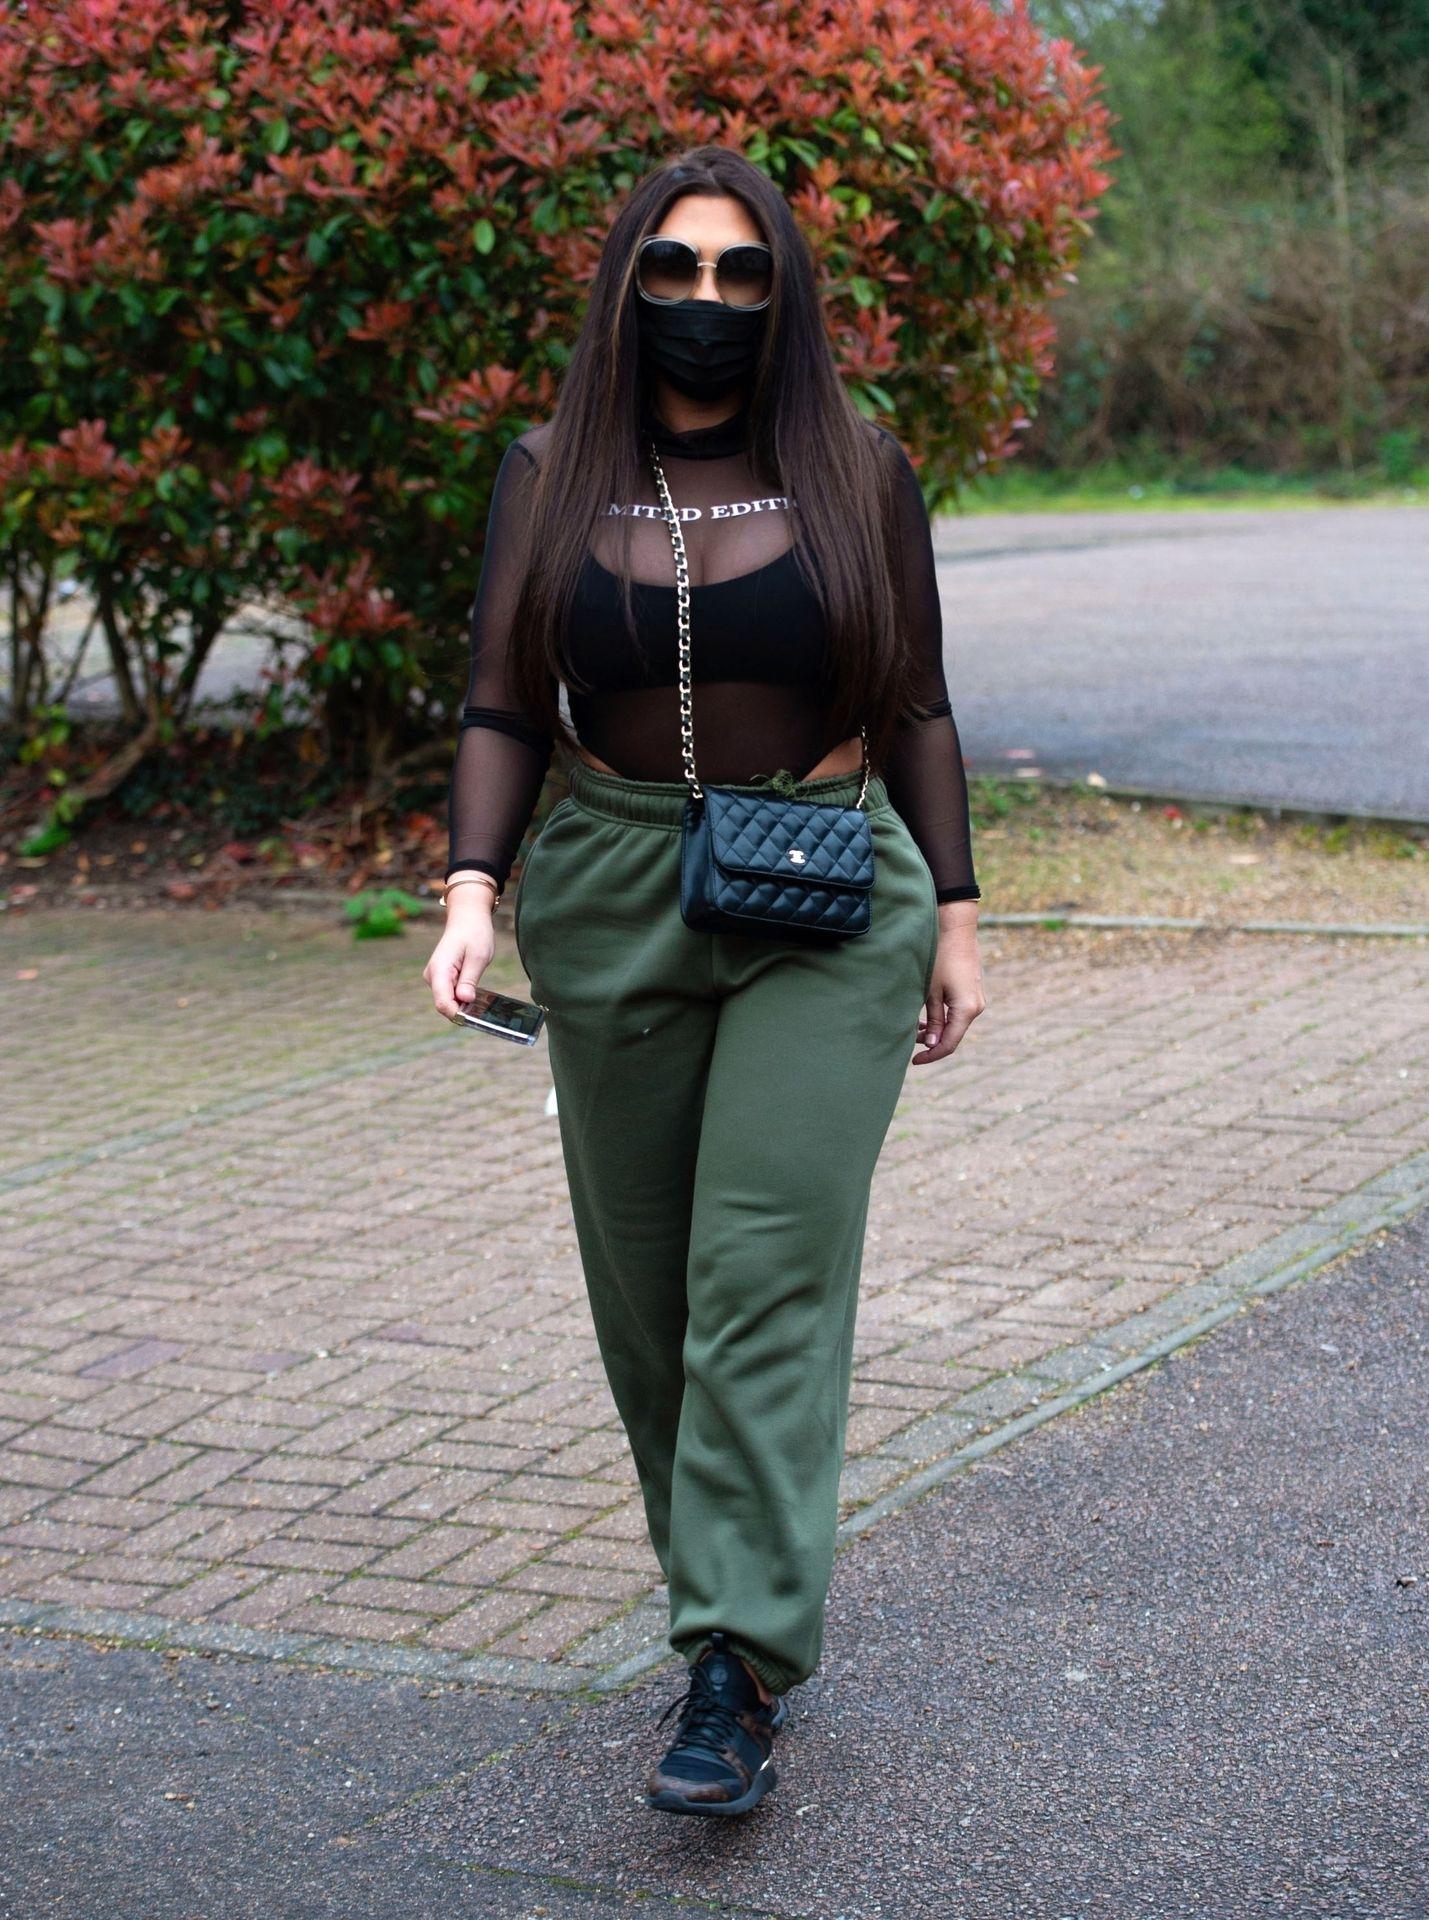 Lauren Goodger Wears A Facial Mask To Protect Against Coronavirus 0006